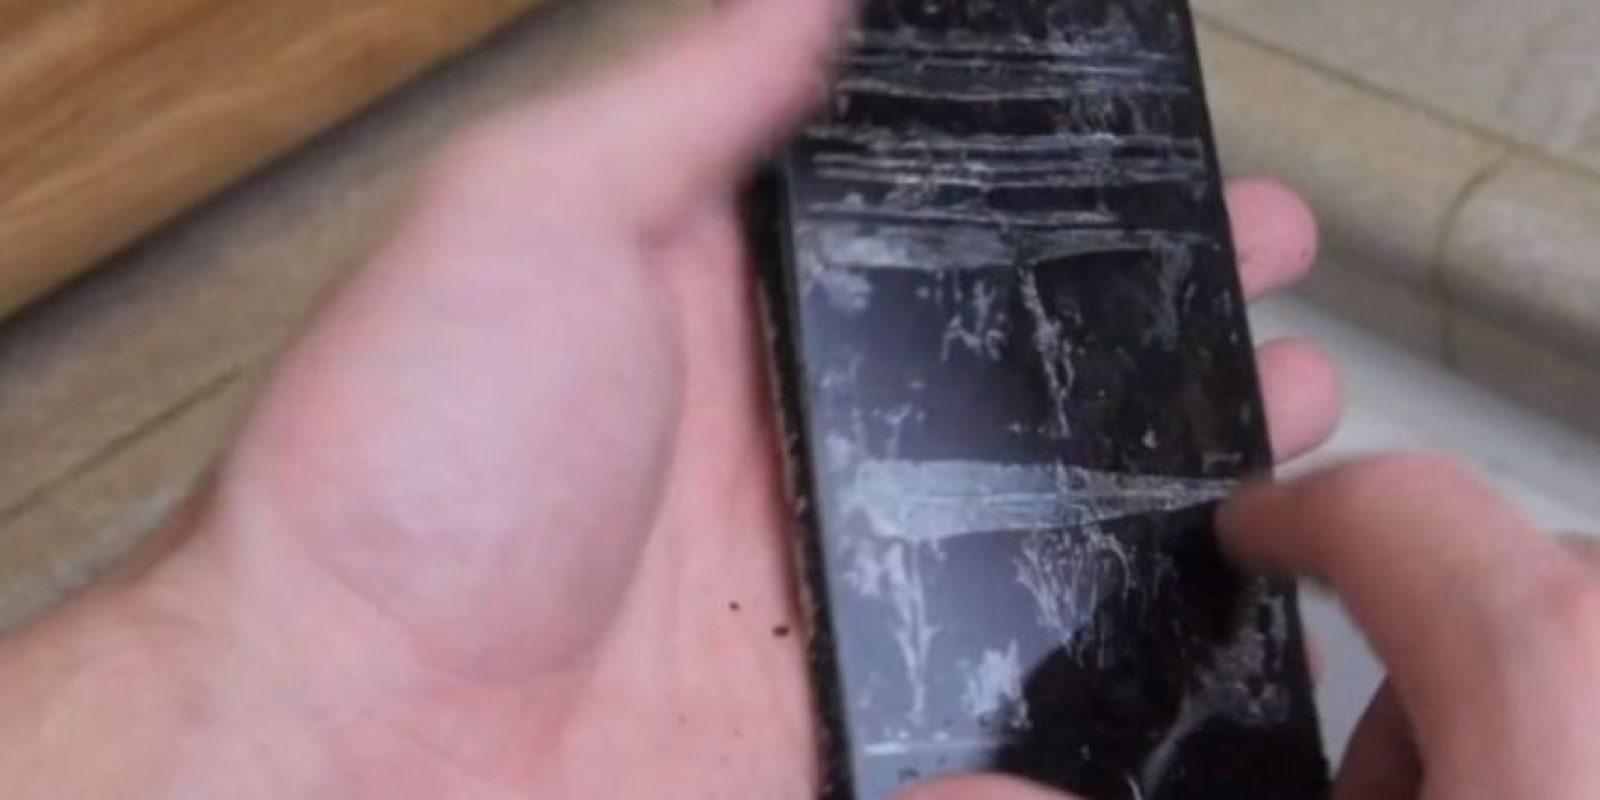 El iPhone 6 ya no sirvió. Foto:vía TechRax